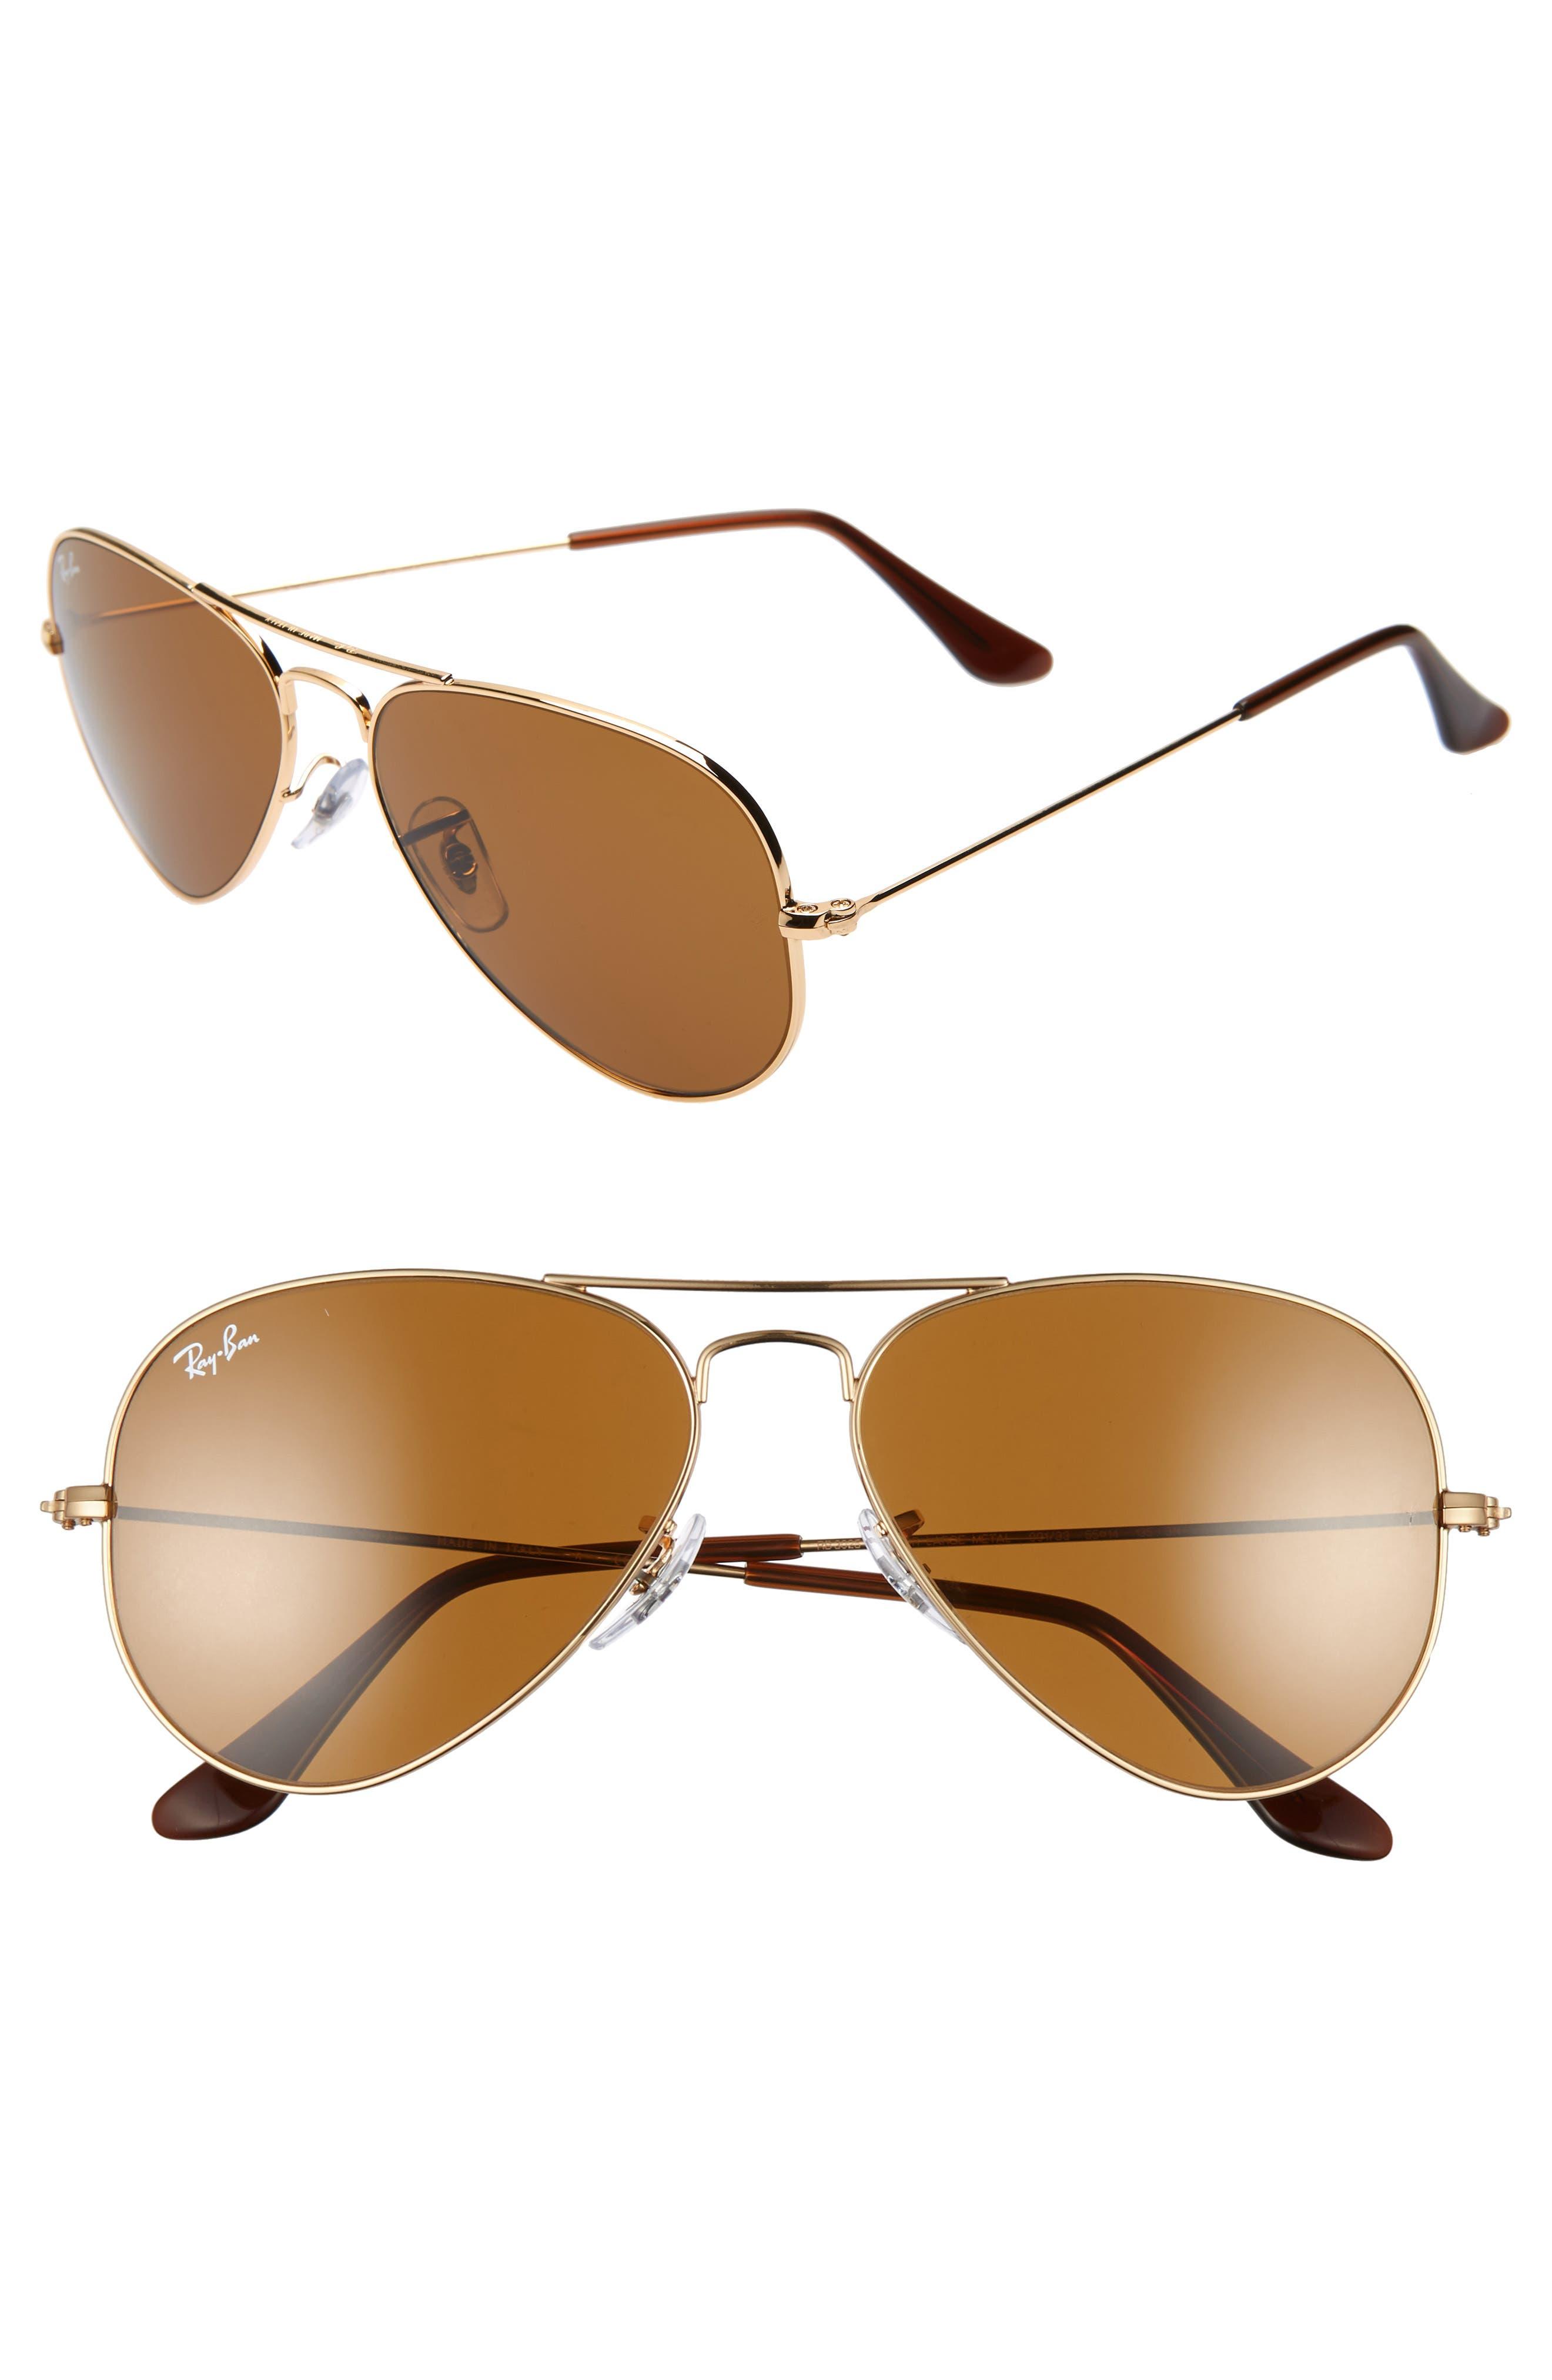 Ray-Ban Small Original 55Mm Aviator Sunglasses - Gold/ Brown Solid